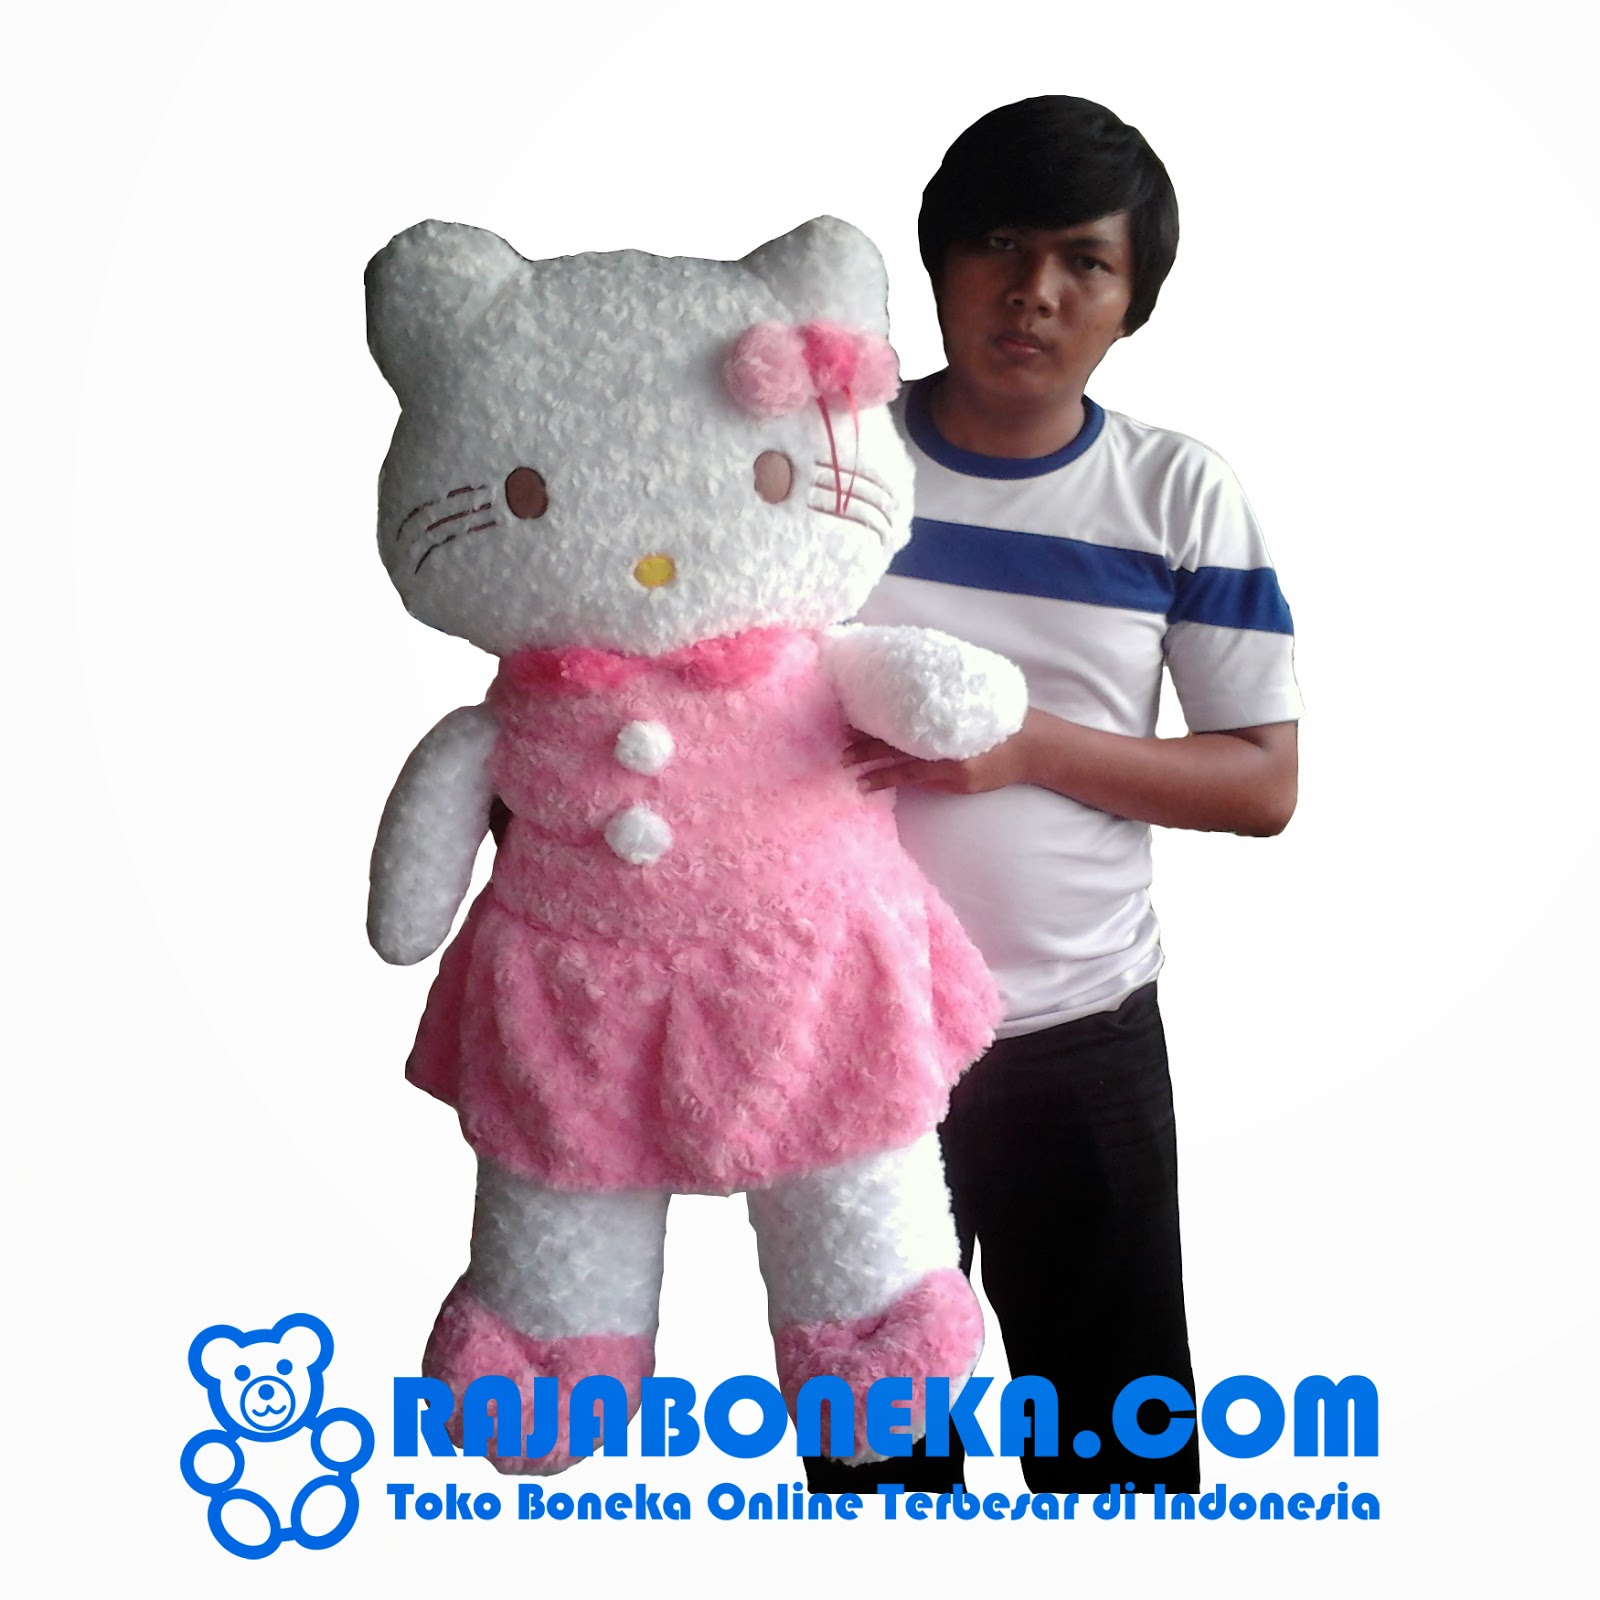 Toko Boneka Panda Online di Jakarta f9d279ffb8